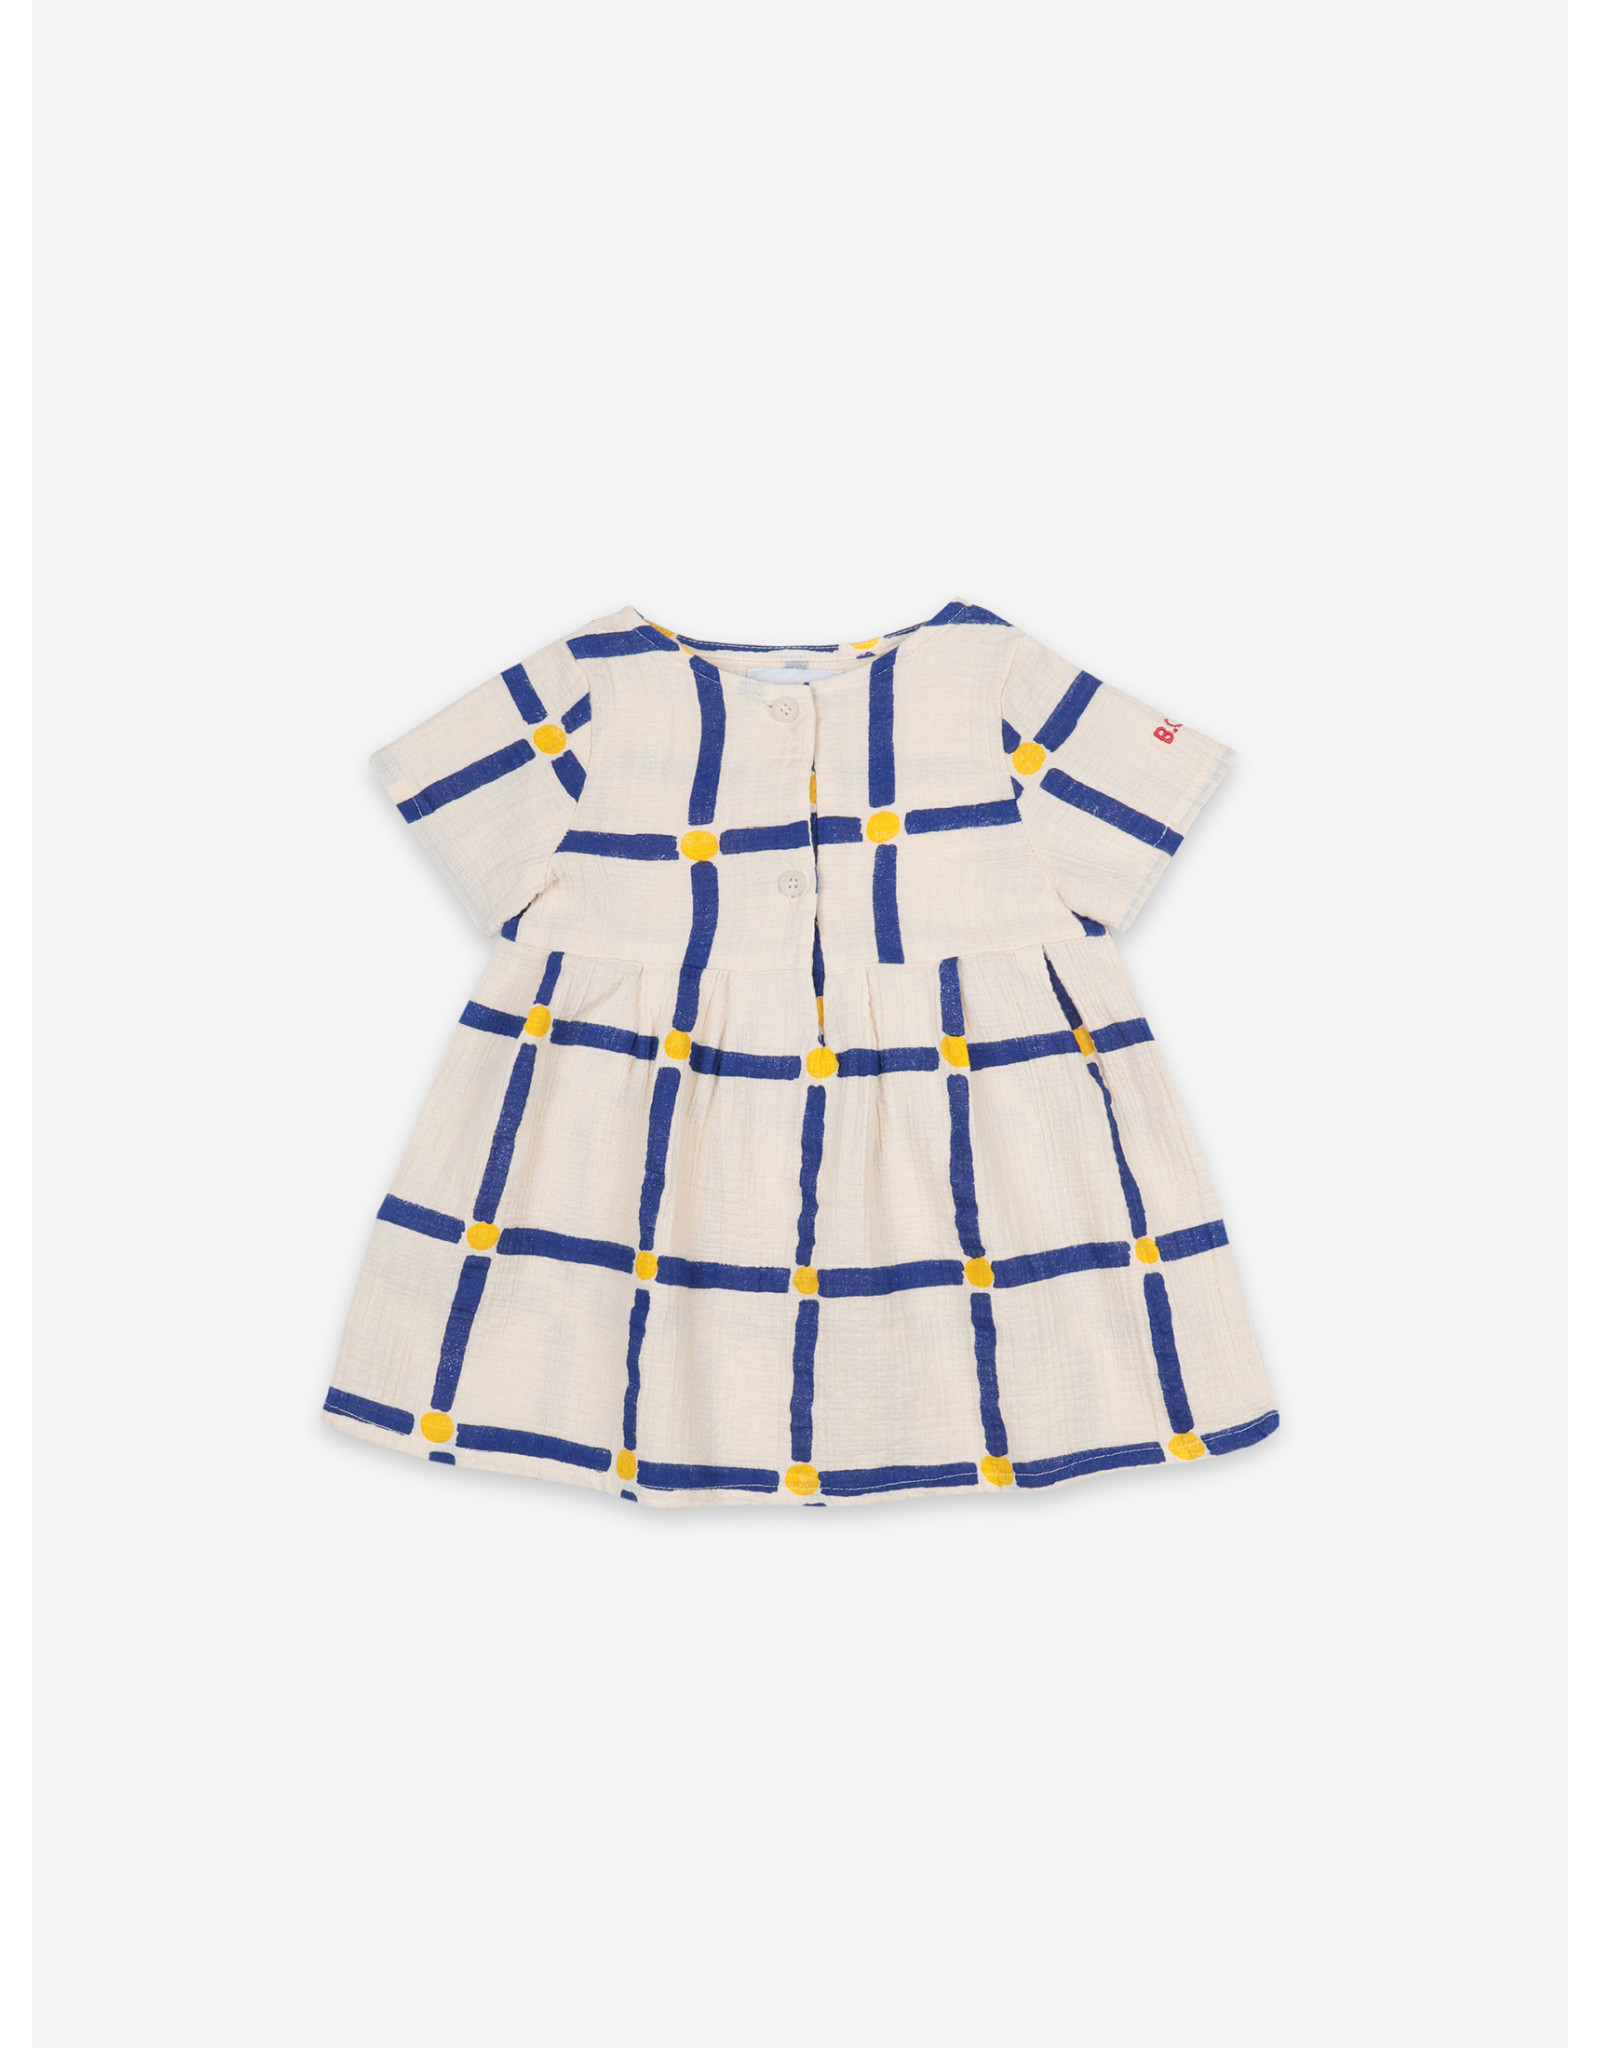 Bobo Choses Bobo Choses Cube All Over Buttoned Dress